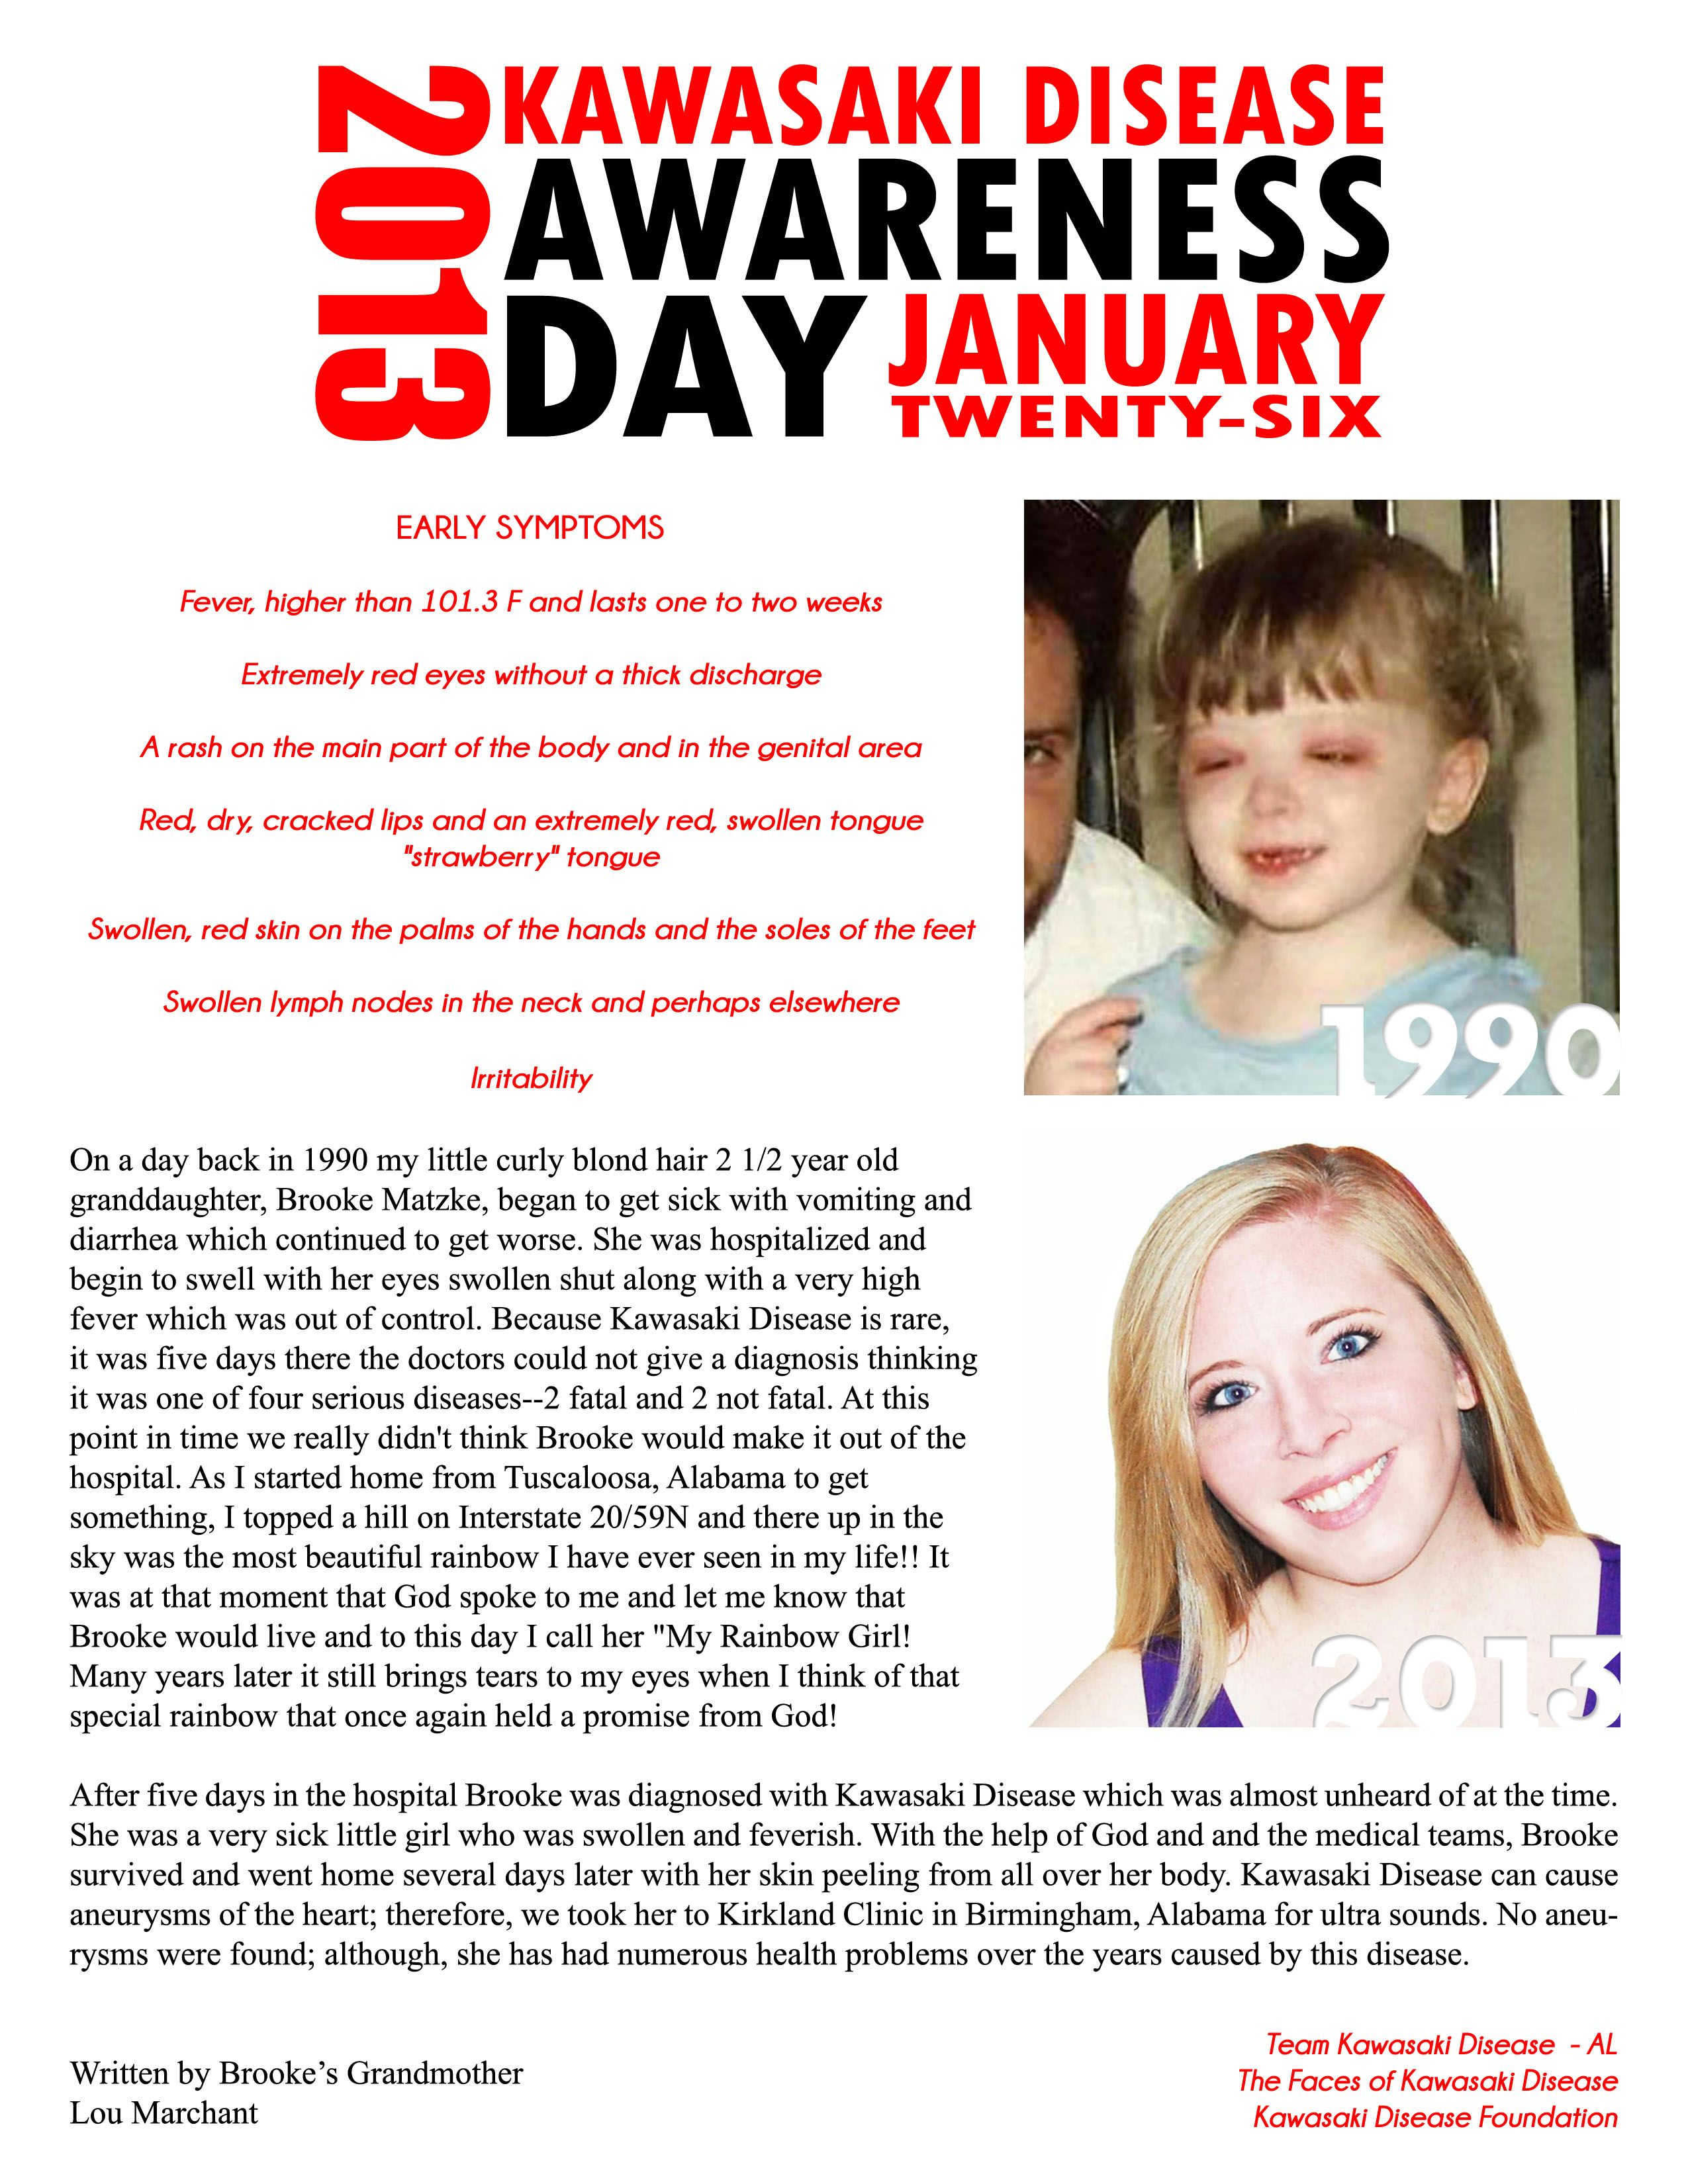 Wear Red Saturday 1 26 For Kawasaki Disease Awareness Day Kid S